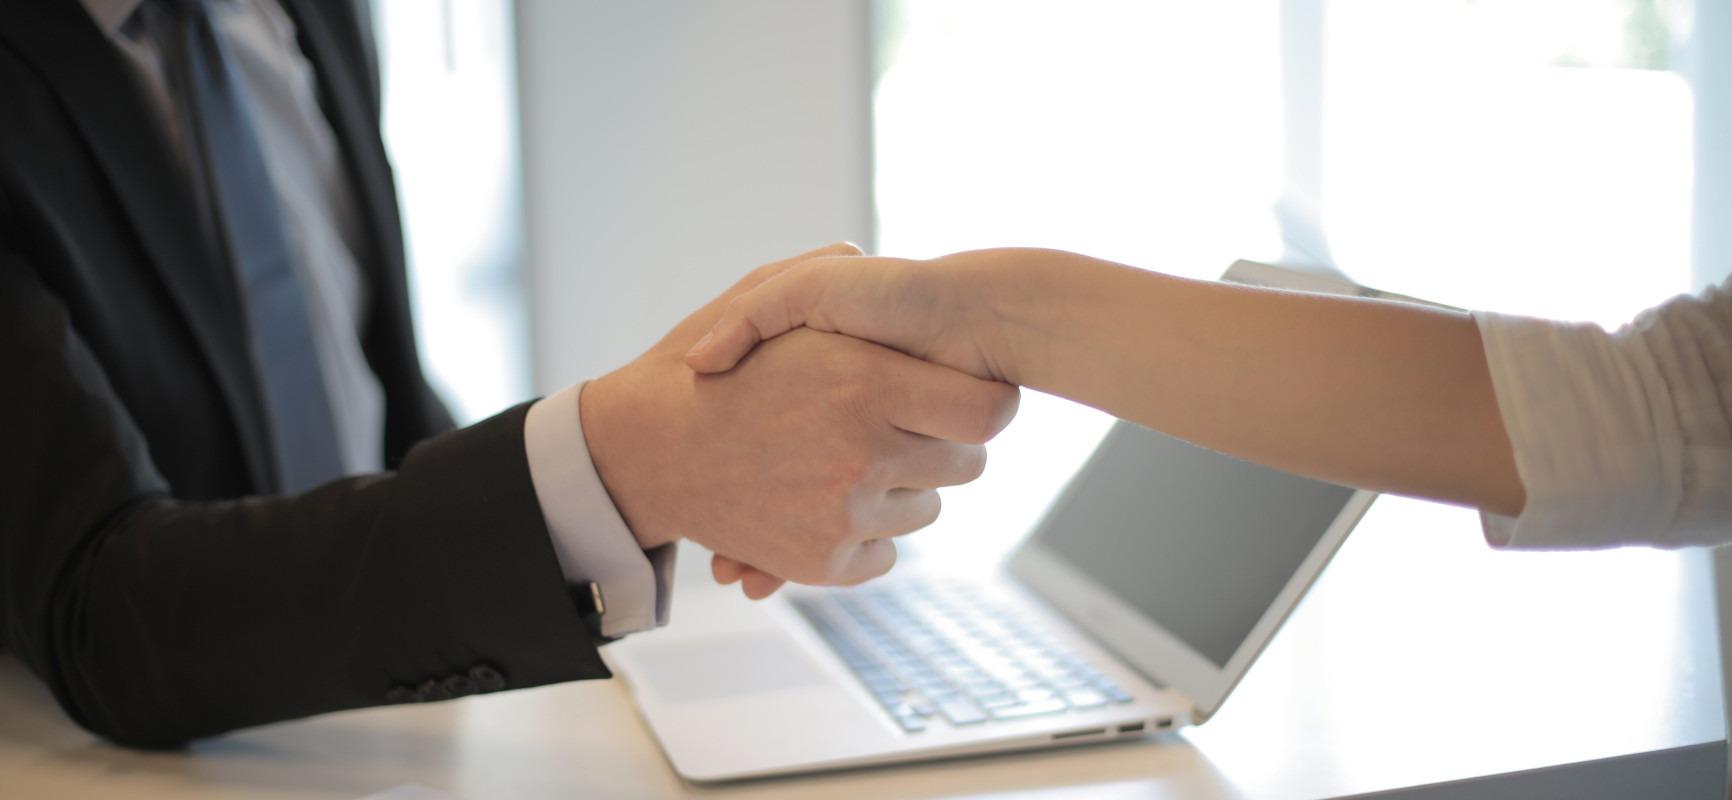 ROC-ECLERC-PREVOYANCE-Dossiers-thematiques-Contrat-obseques